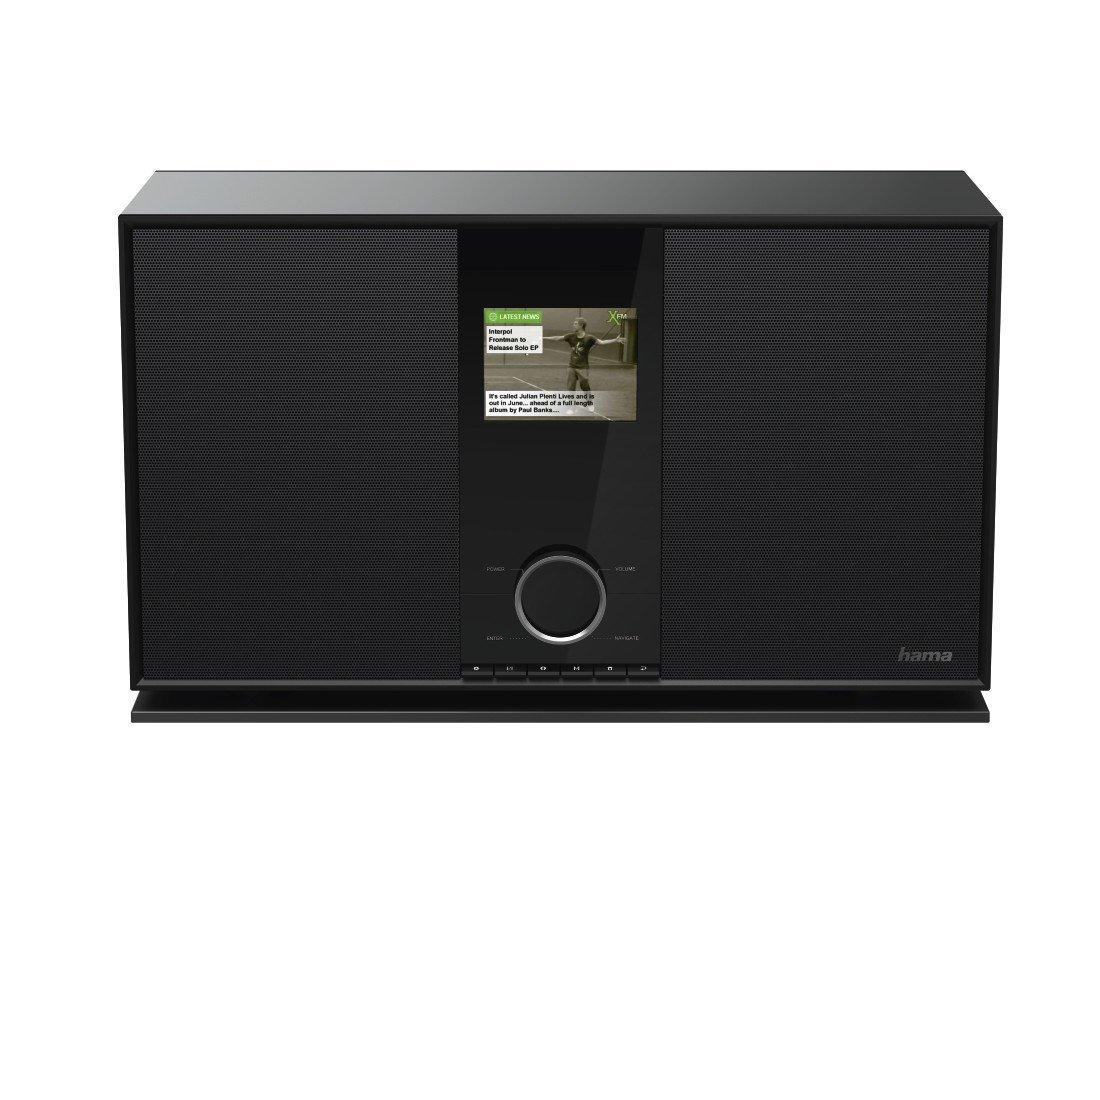 Hama Hama dir3600mbt Internet - Radio, màu đen (3.5 mm, AAA, Internet, 300 – 18000 HZ, TFT, DAB, DAB